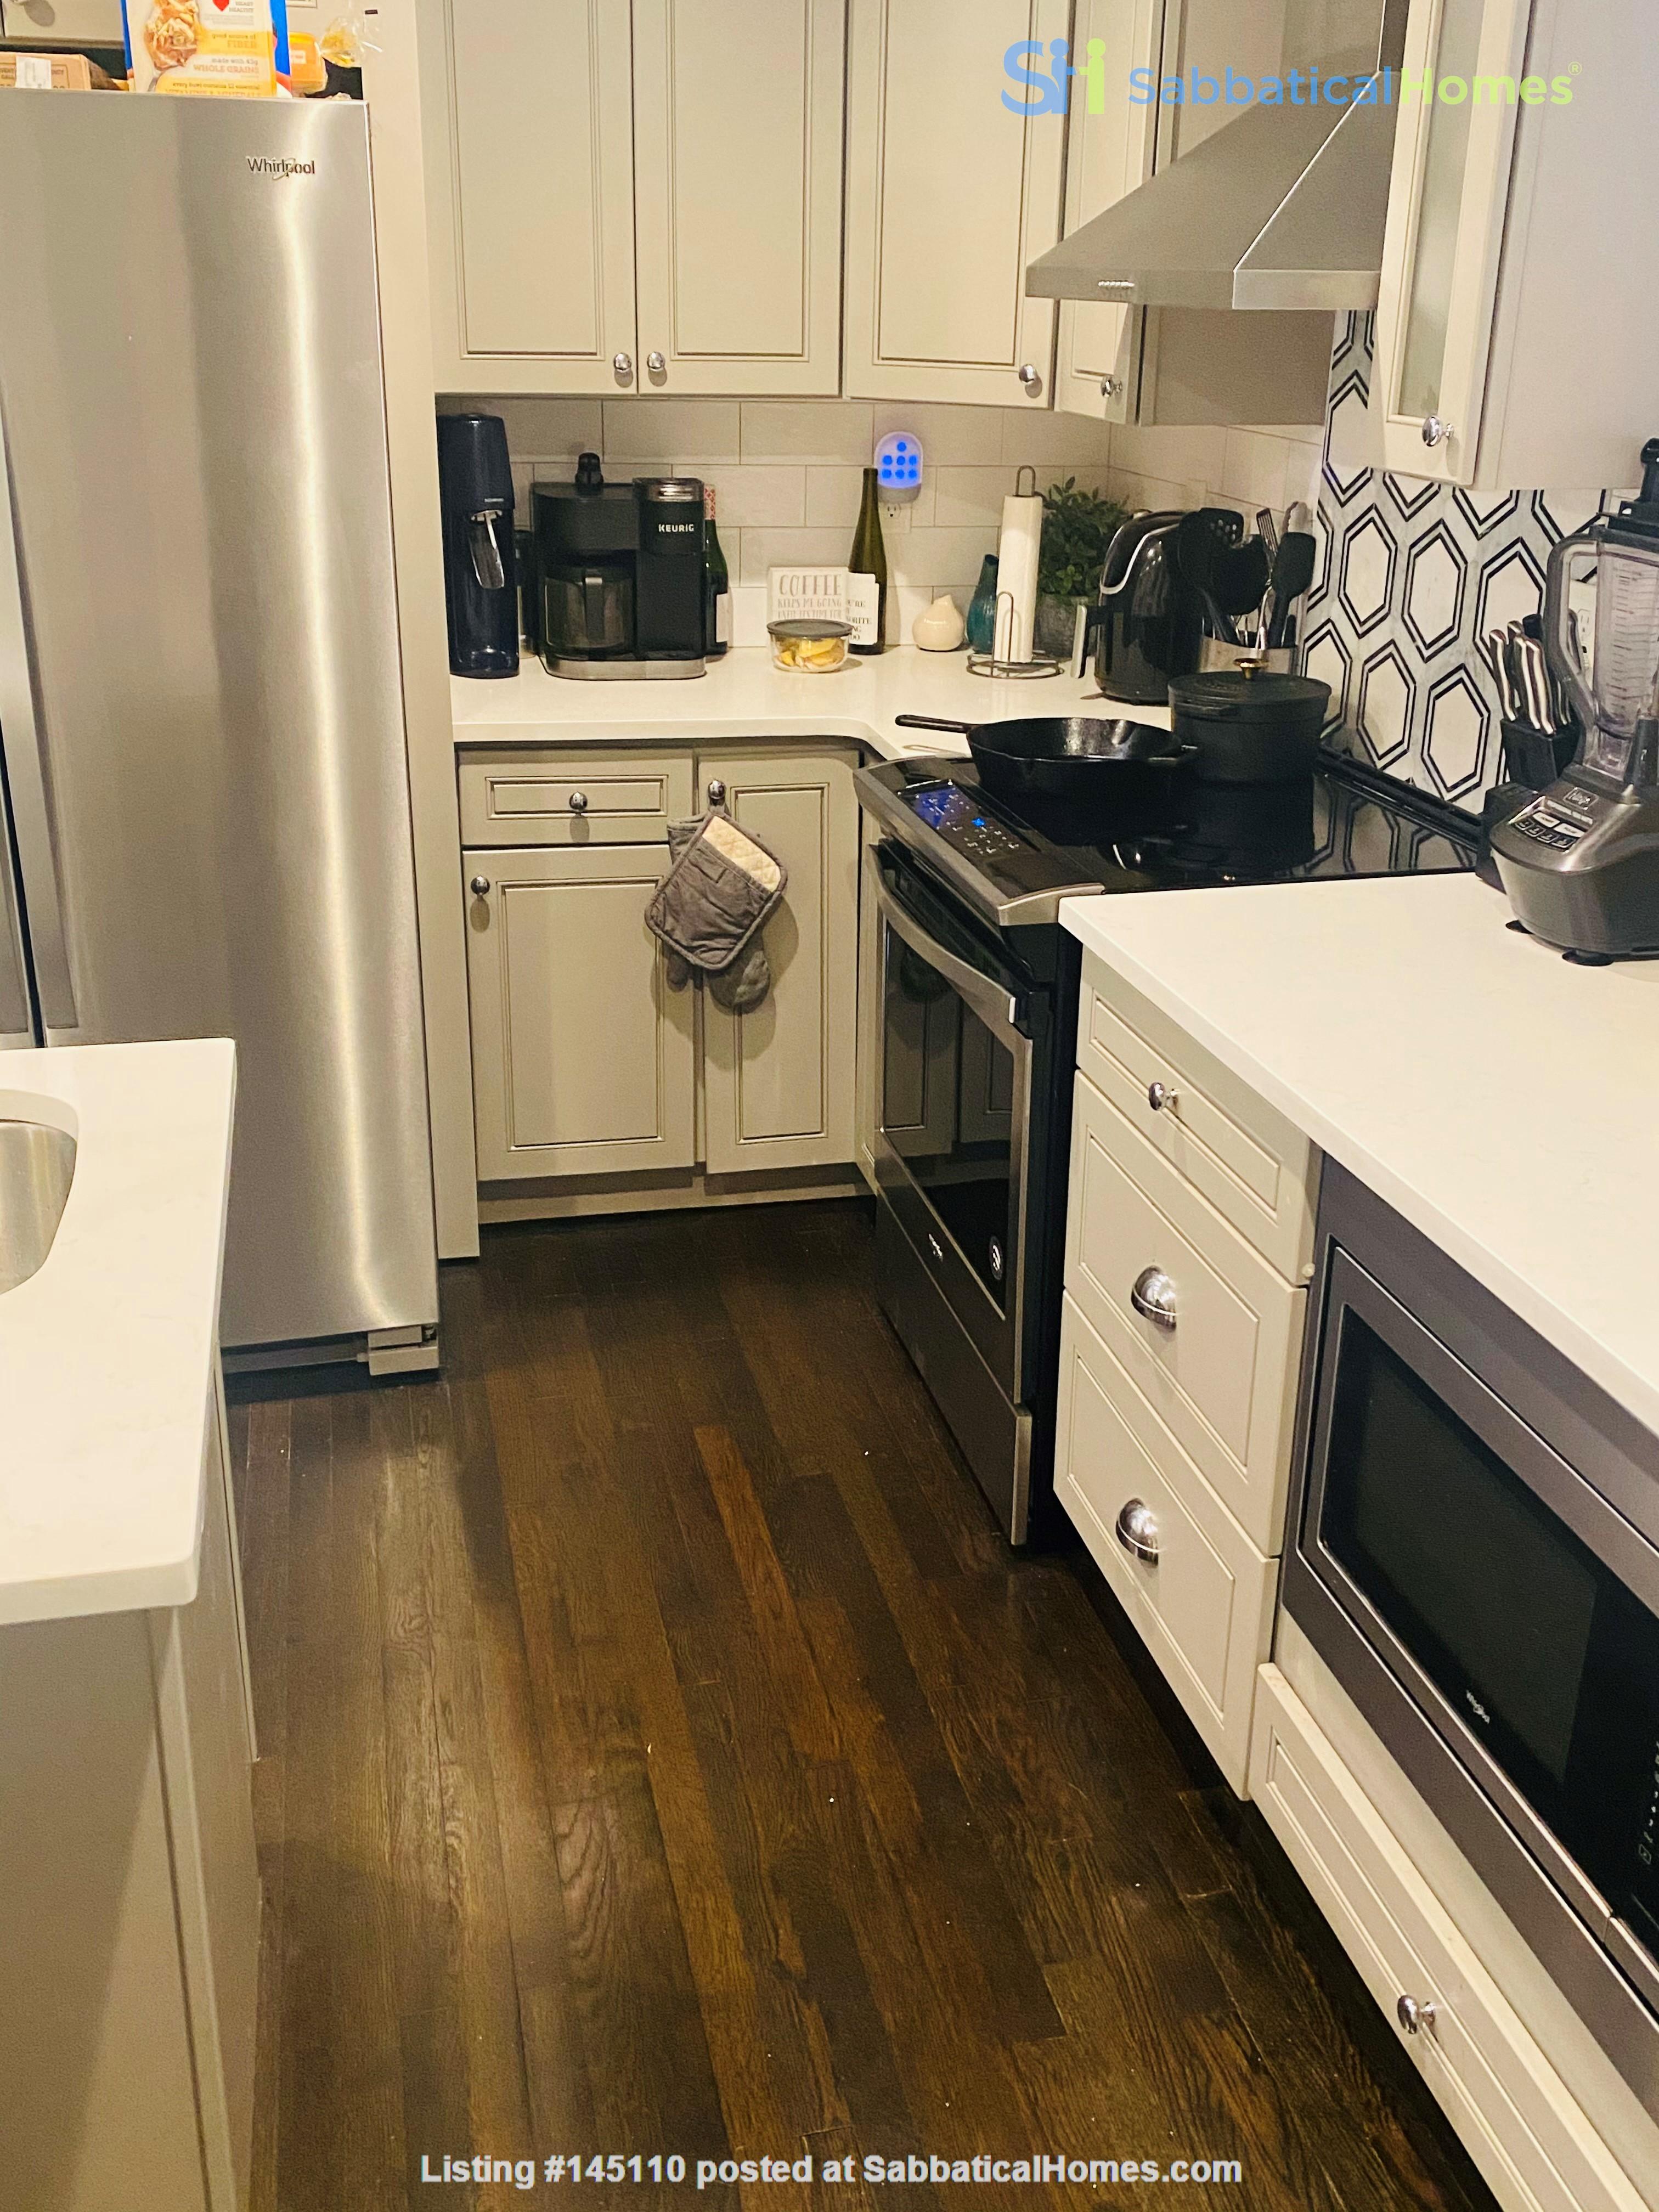 Perfect writer's haven in Southwest Atlanta! 15 mins from Midtown! Home Rental in Atlanta, Georgia, United States 3